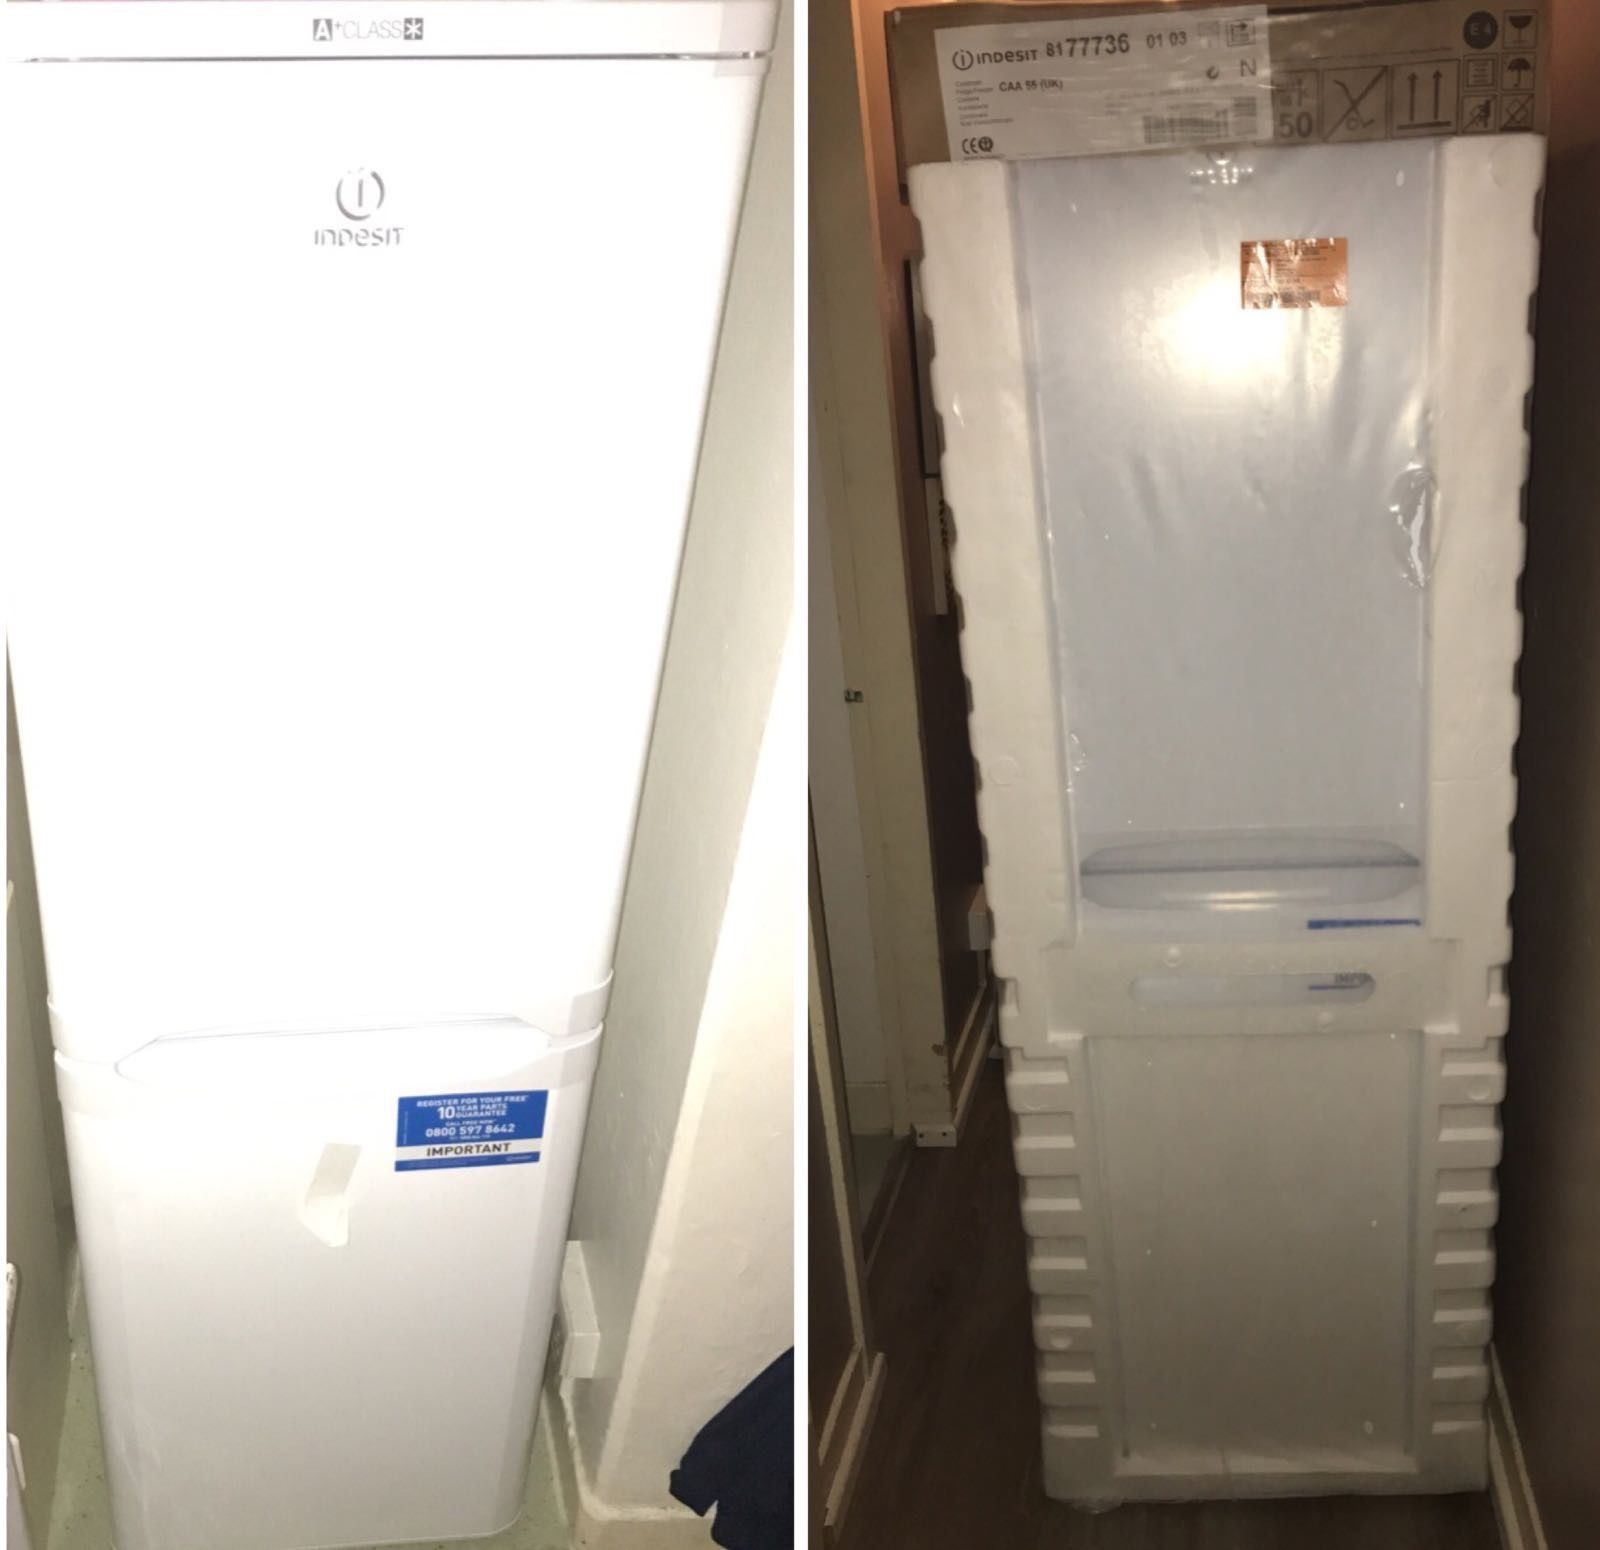 Indesit CAA 55 234L Bottom Freezer FRIDGE COLD WHITE BARGAIN CHRISTMAS  https://t.co/uZTQix4Pzm https://t.co/7a10C90taB